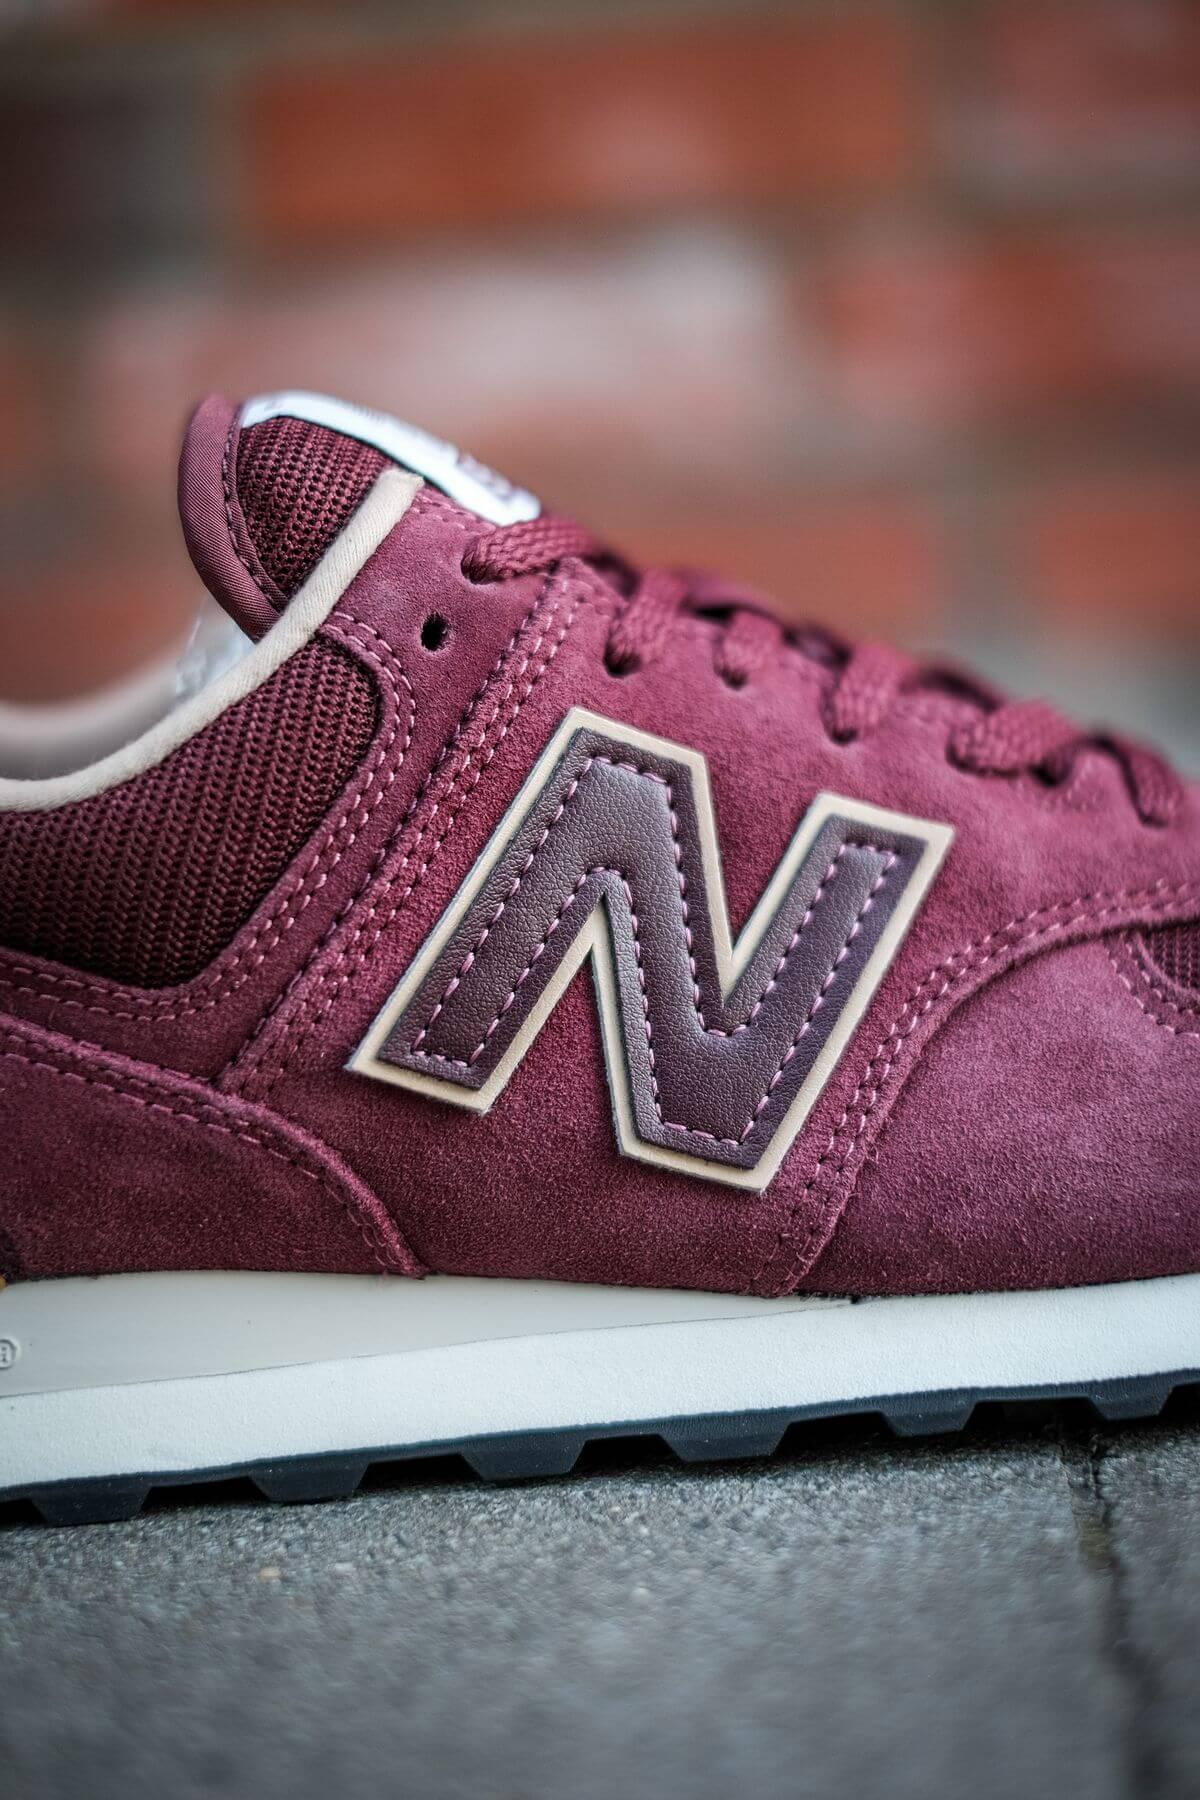 details - N branding -  New Balance - 574 History Class Pack - ML574BG2 - burgundy